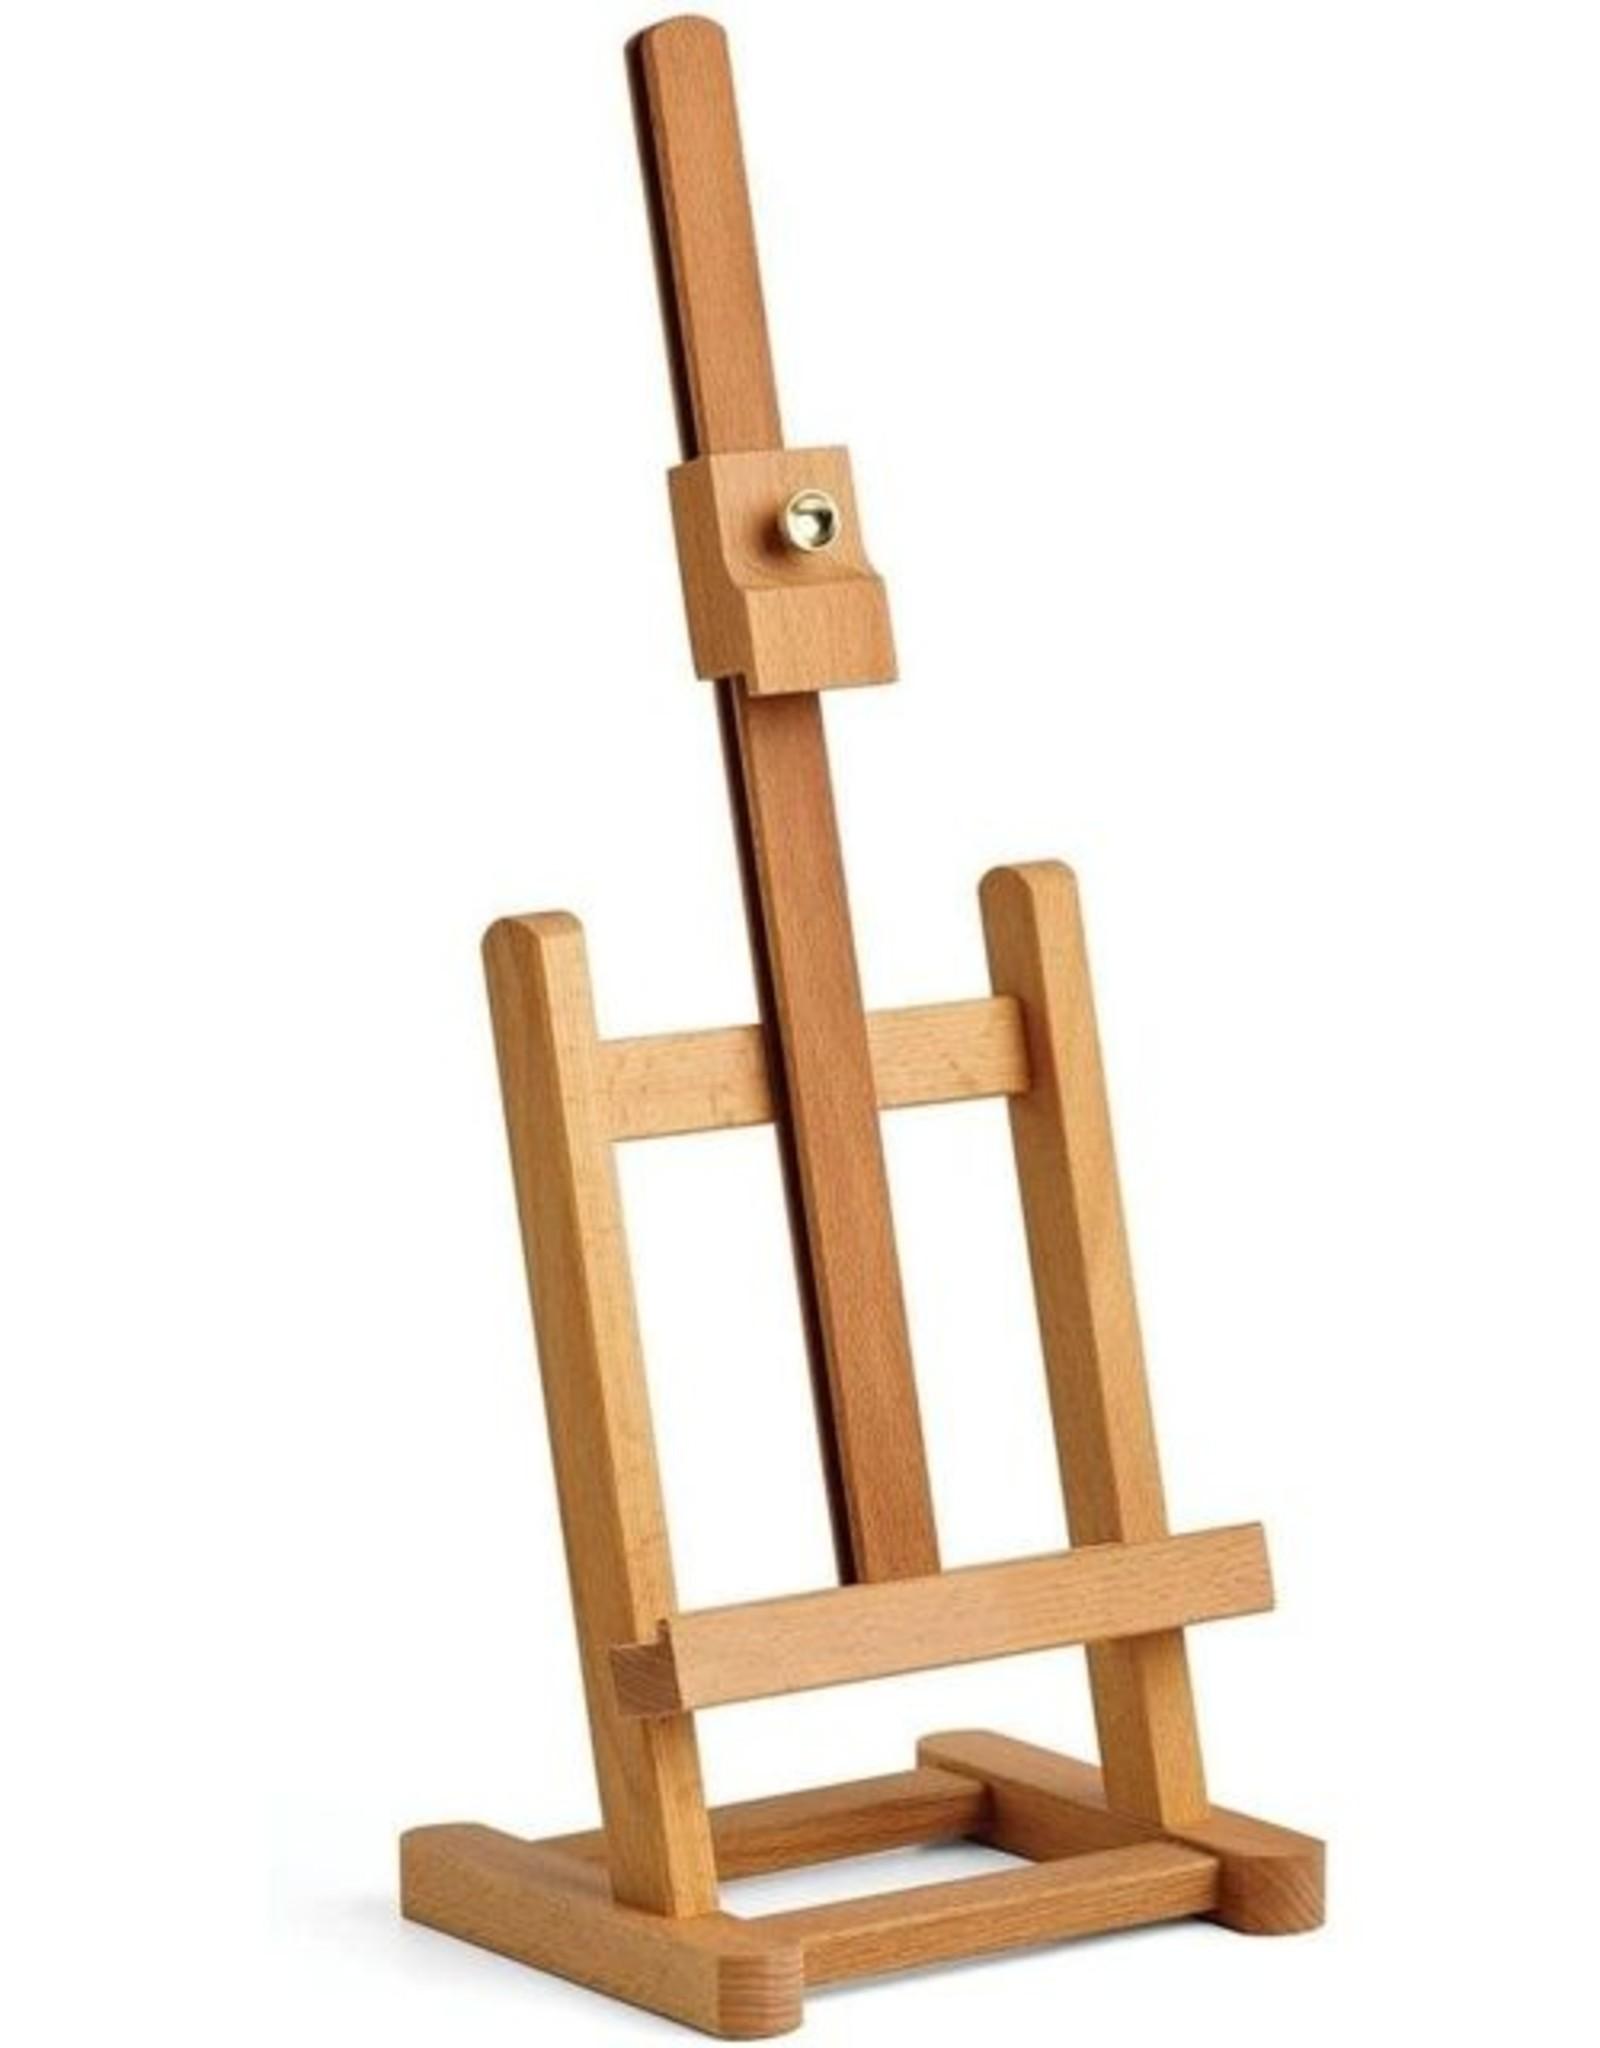 COLART Mini Tafelezel/ table easel RHINE, 26x13,5cm max doekhoogte 30cm